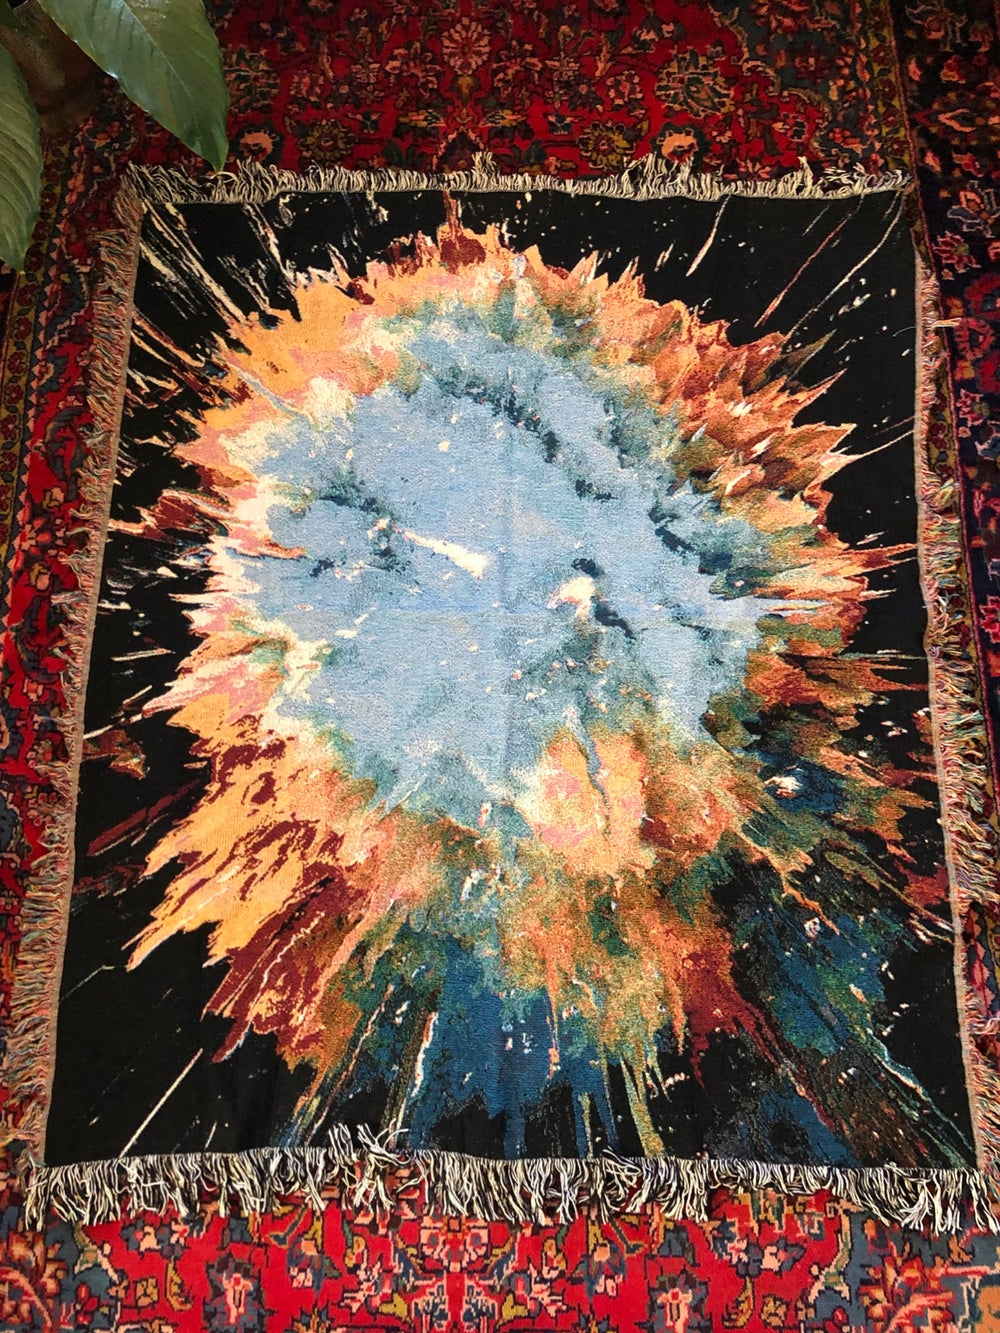 Woven Blanket #21